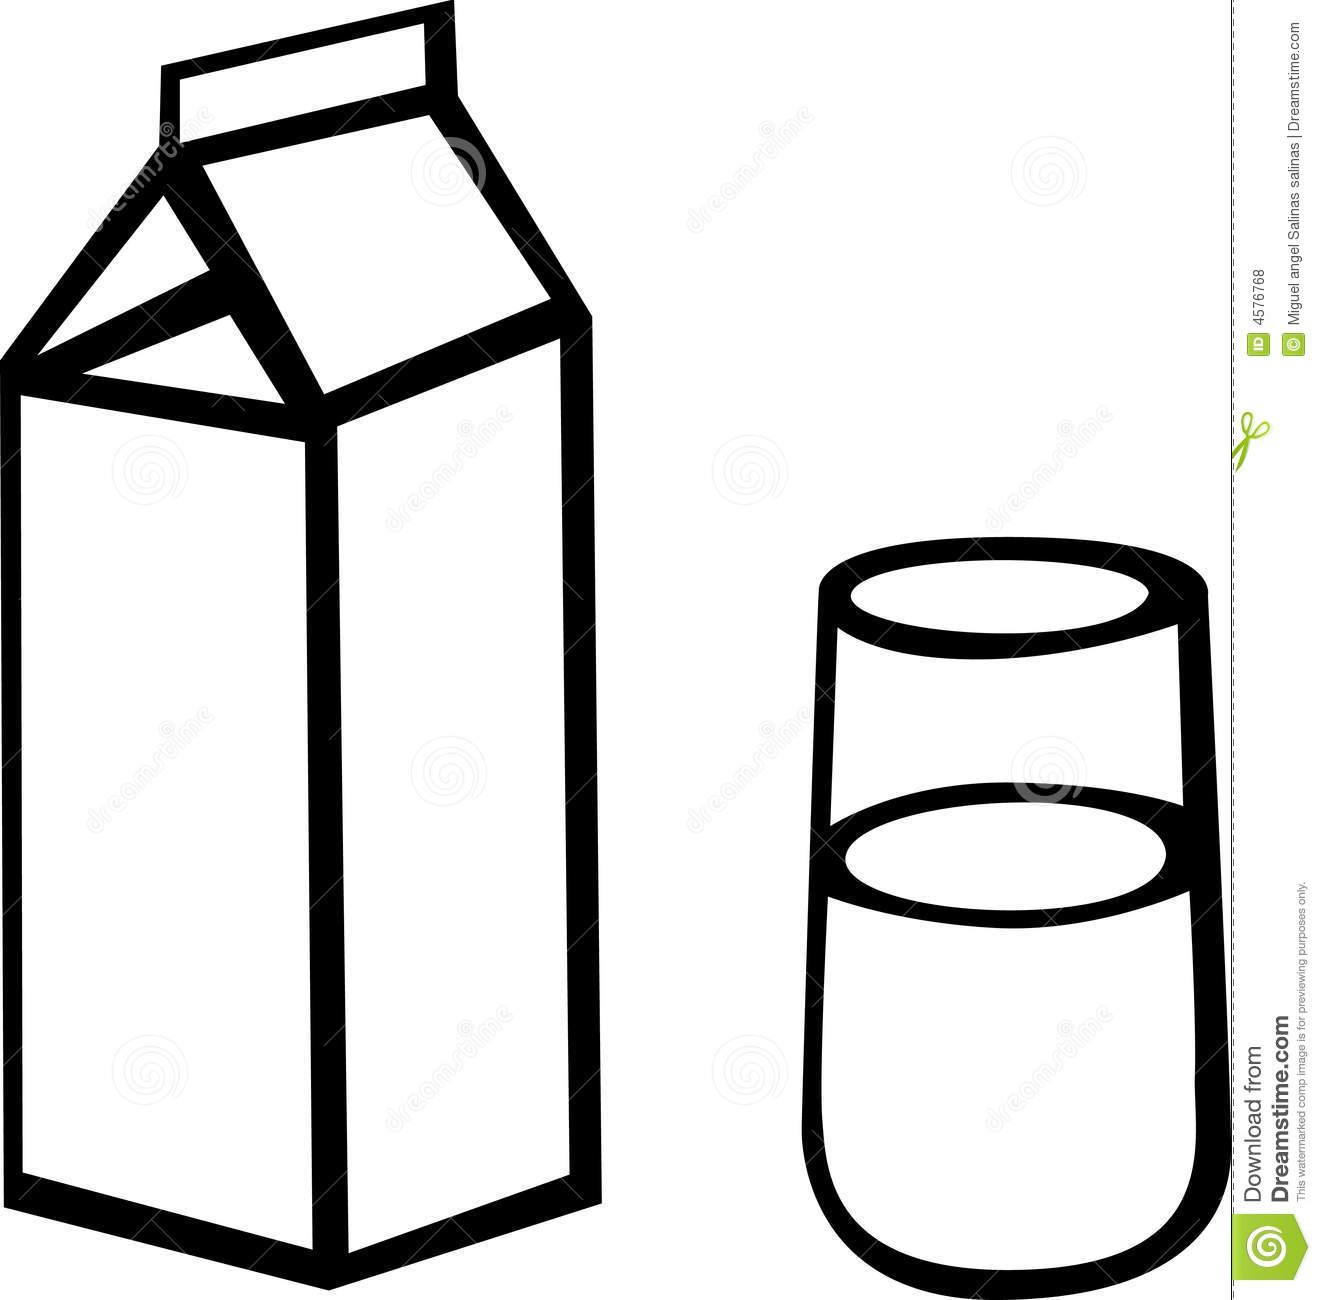 Chocolate Milk Carton Milk Carton Glass Vector Illustration 4576768